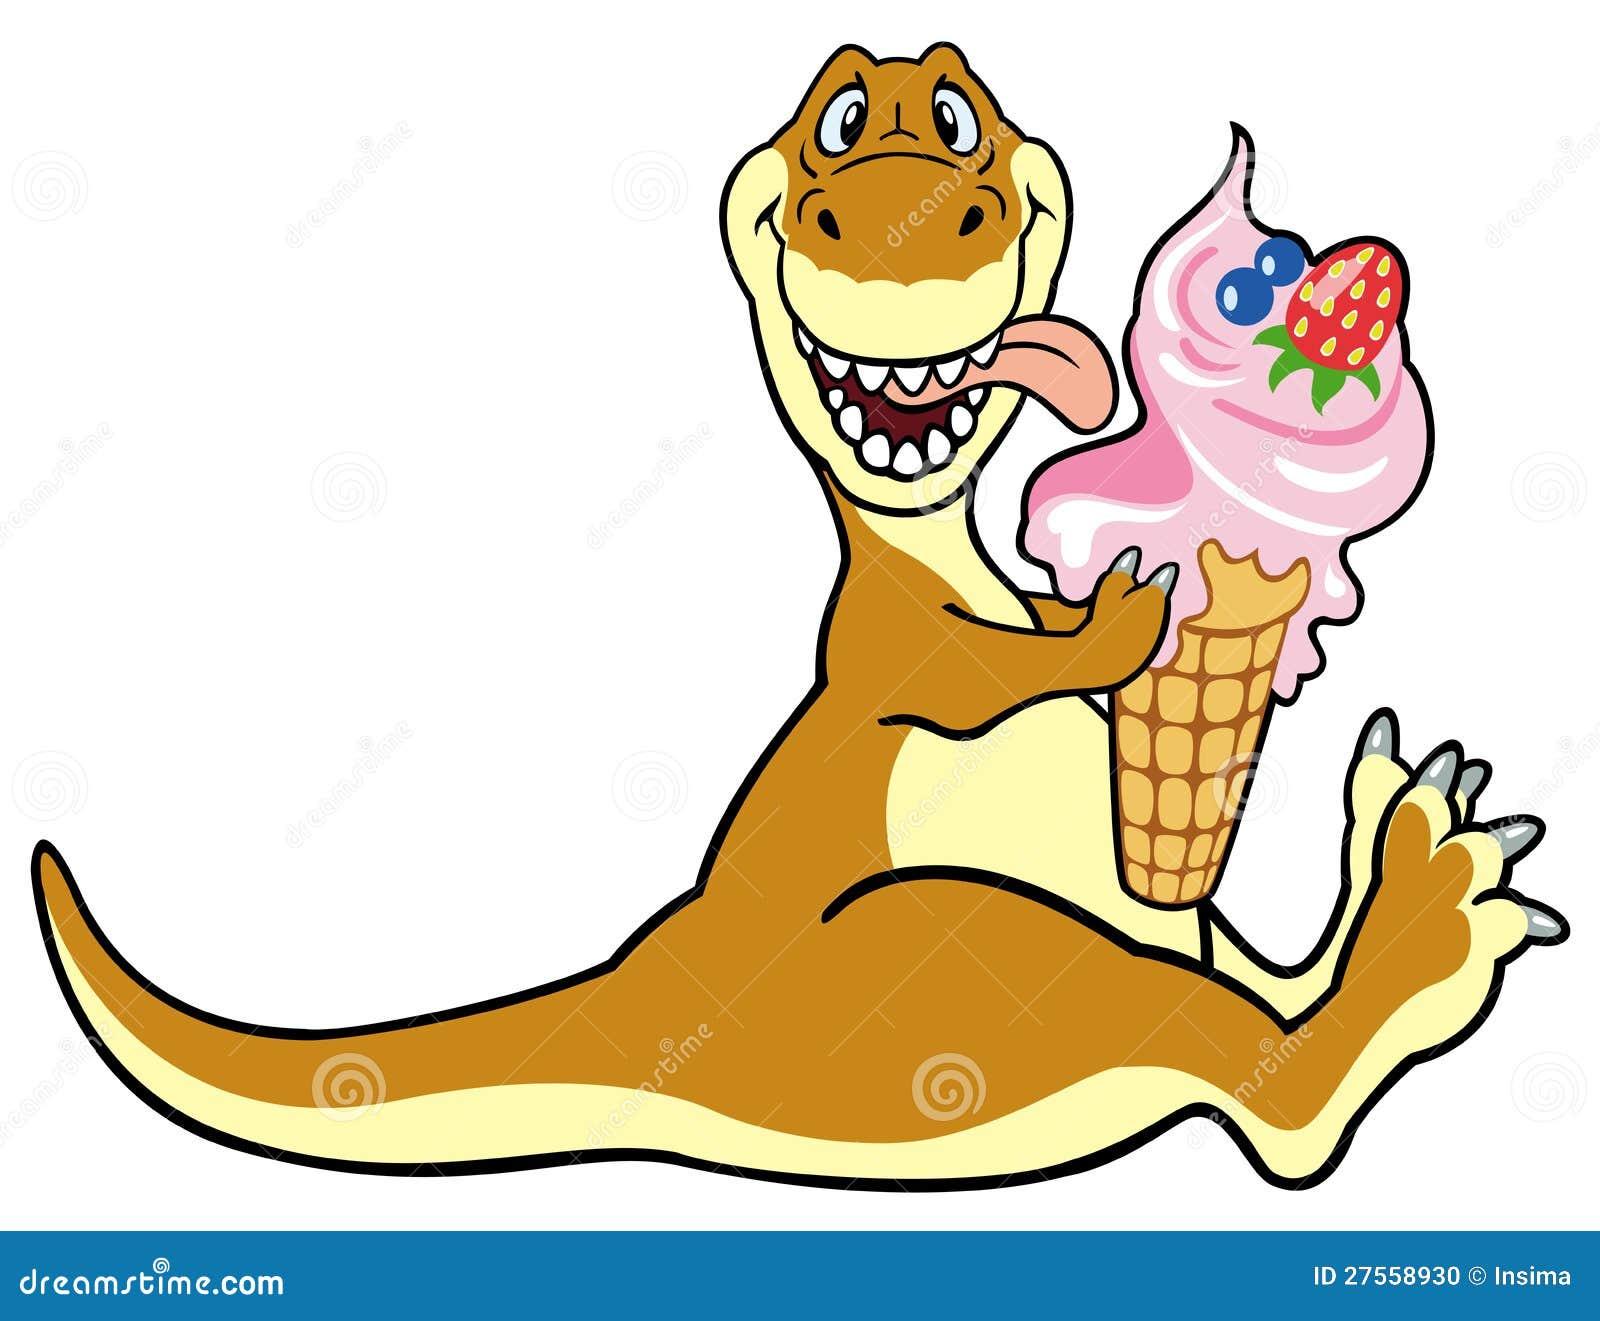 Dino Eating Ice Cream Stock Photo Image 27558930